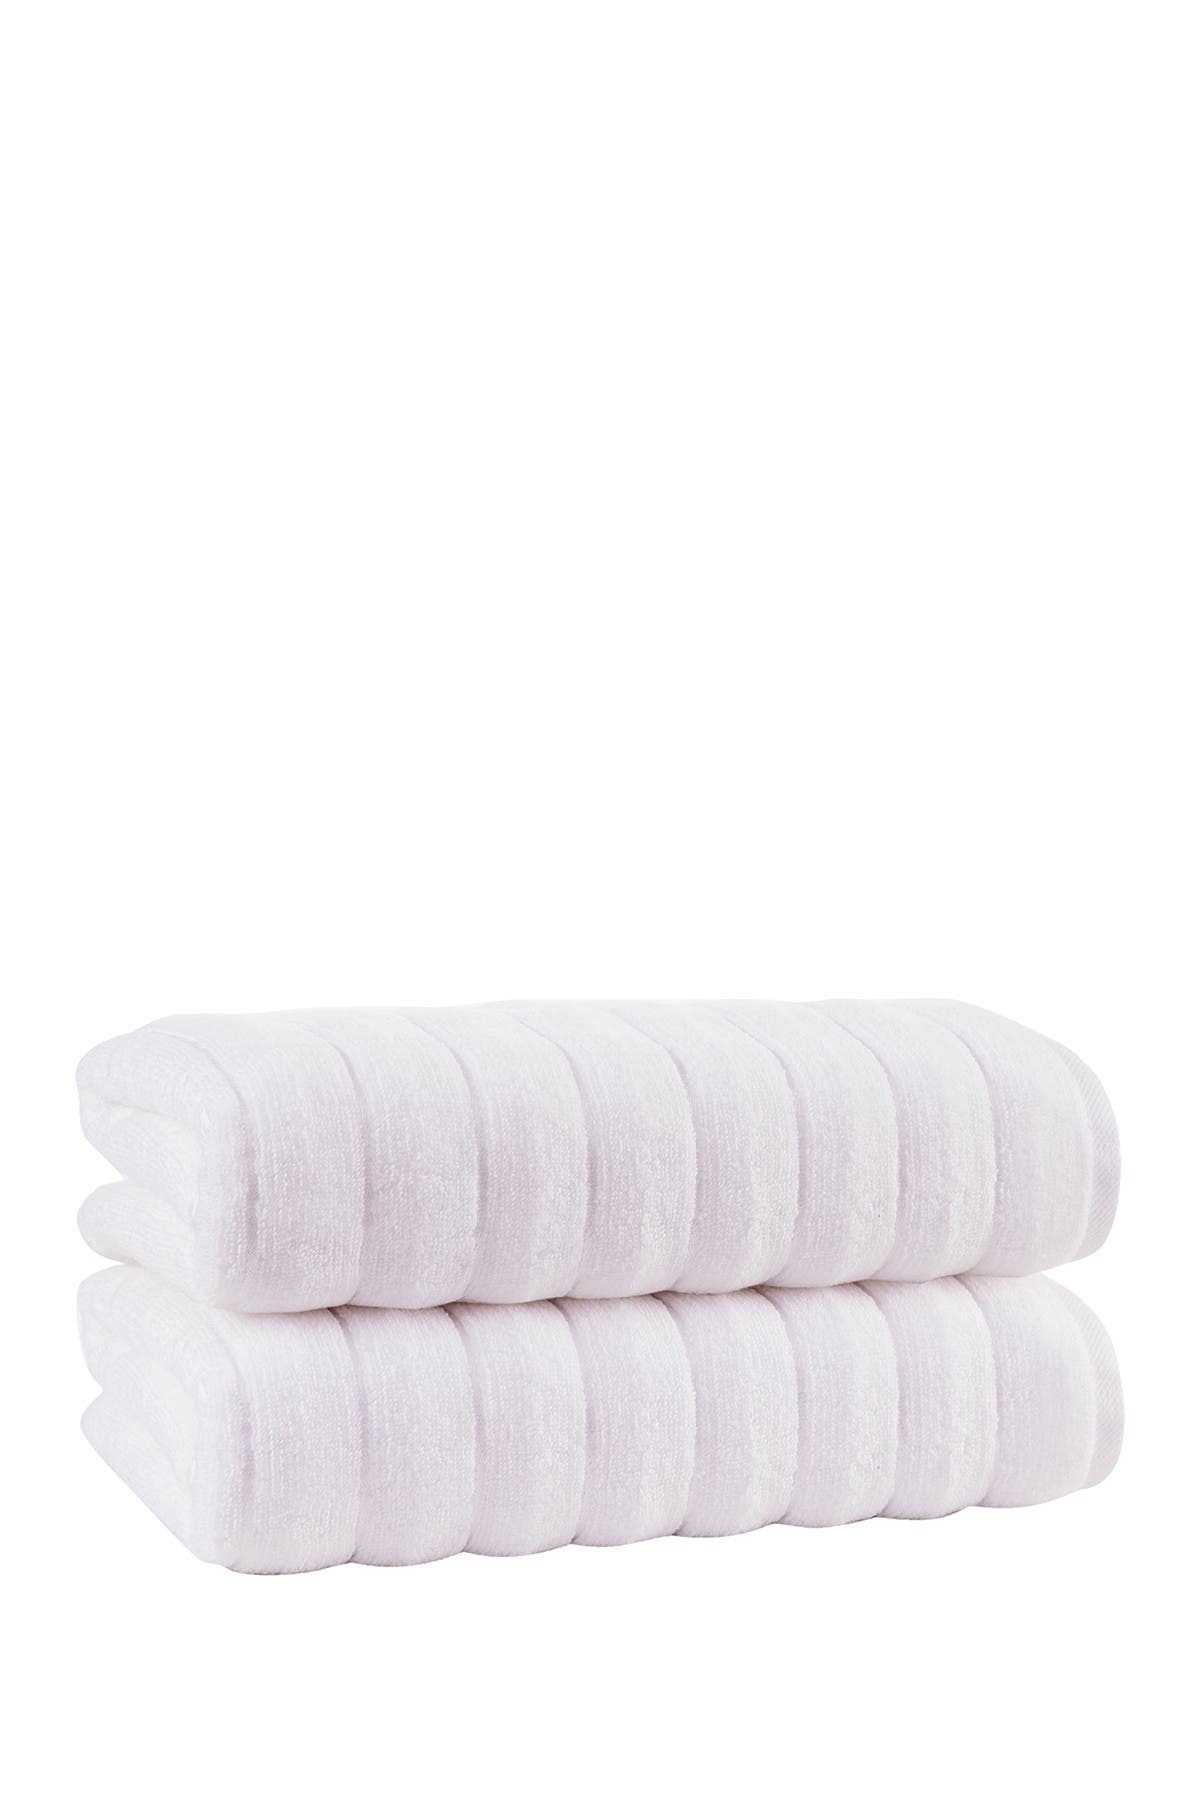 Enchante Home Vague Turkish Cotton Bath Sheet White Set Of 2 Nordstrom Rack